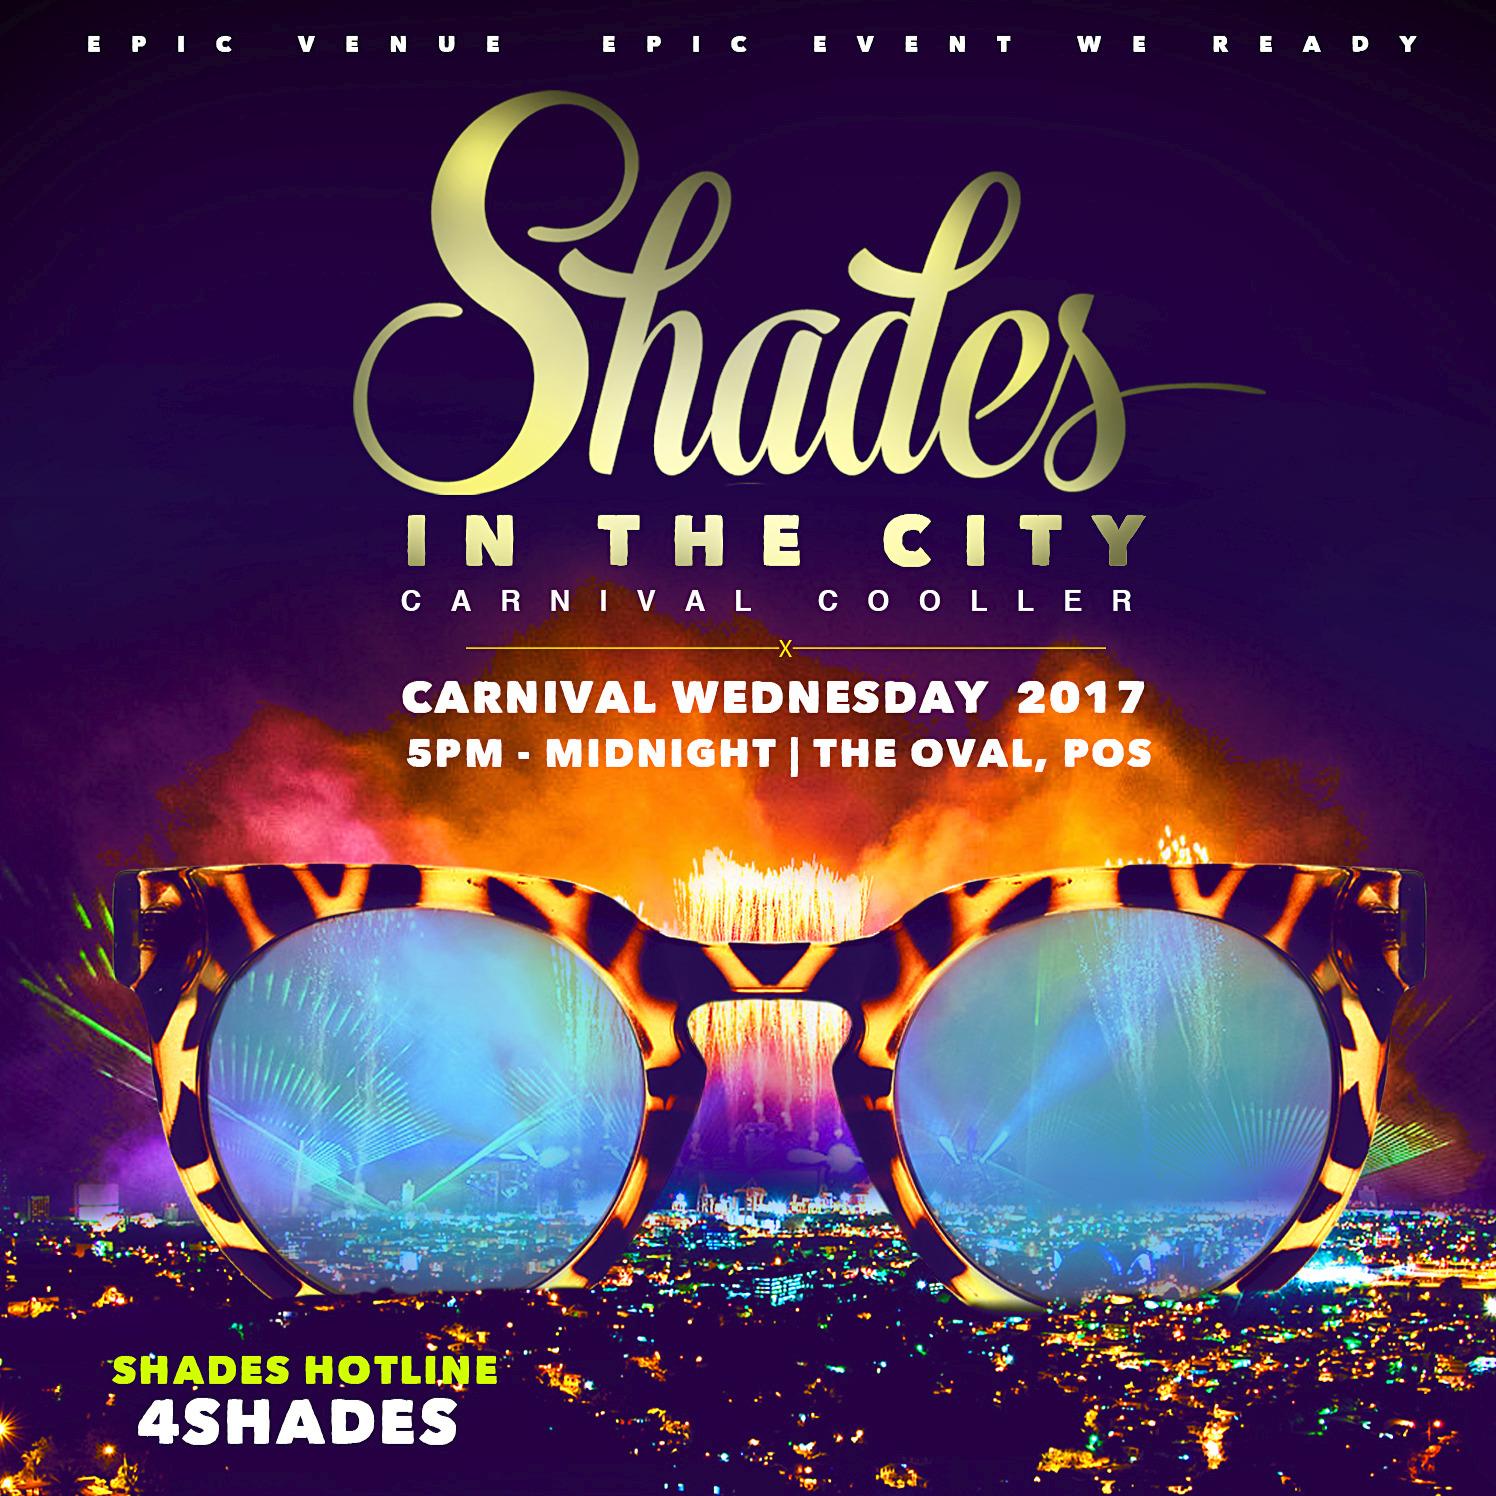 SHADES CARNIVAL COOLER 2017